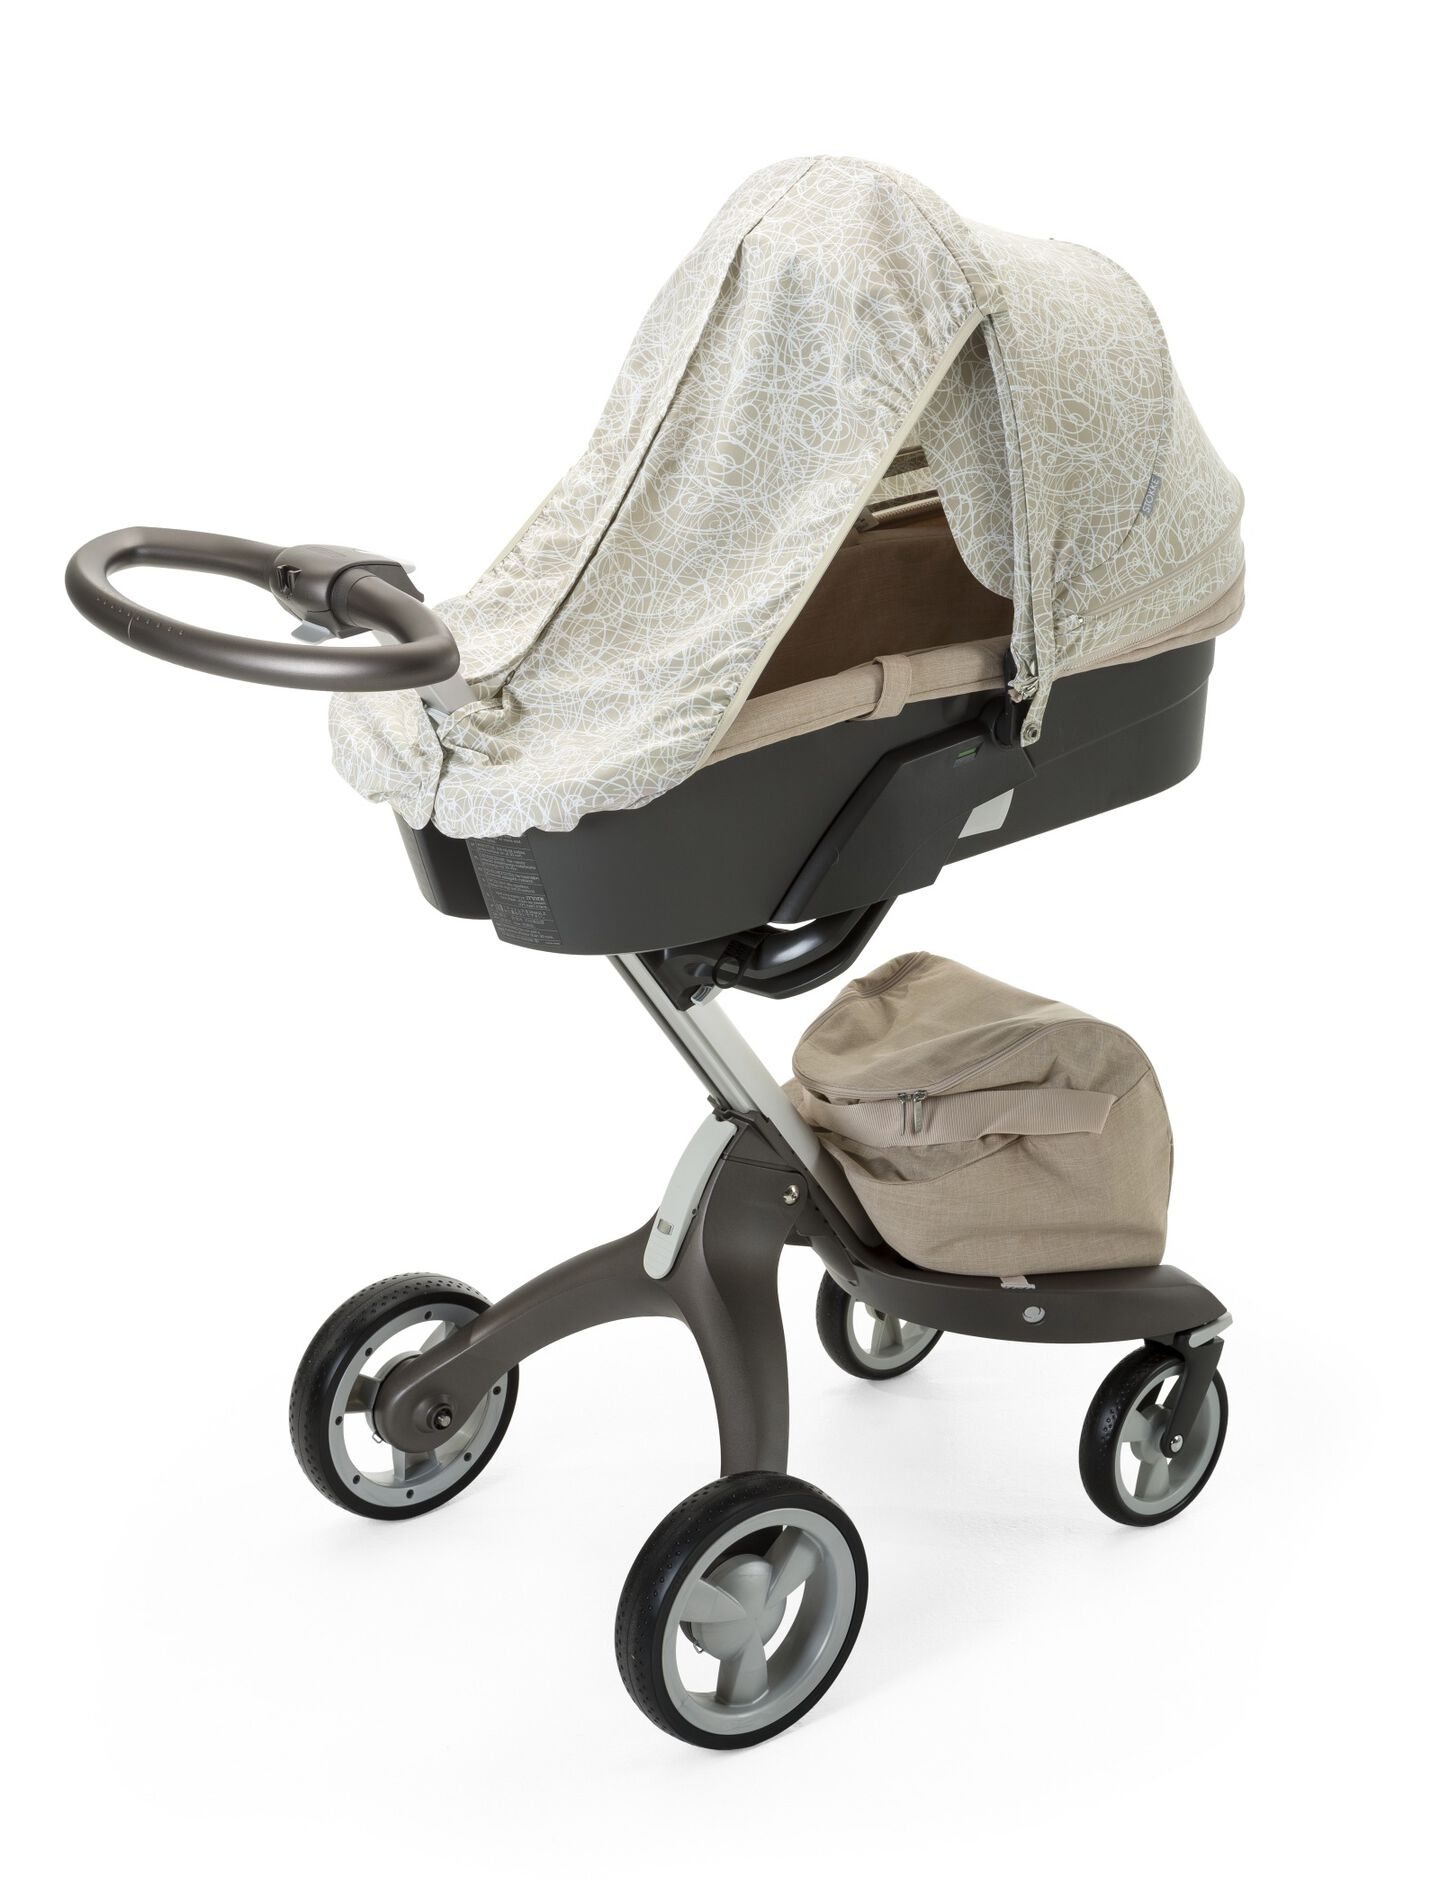 Stokke® Stroller Summer Kit Scribble Sandy Beige with Stokke® Xplory™ chassis, Melange